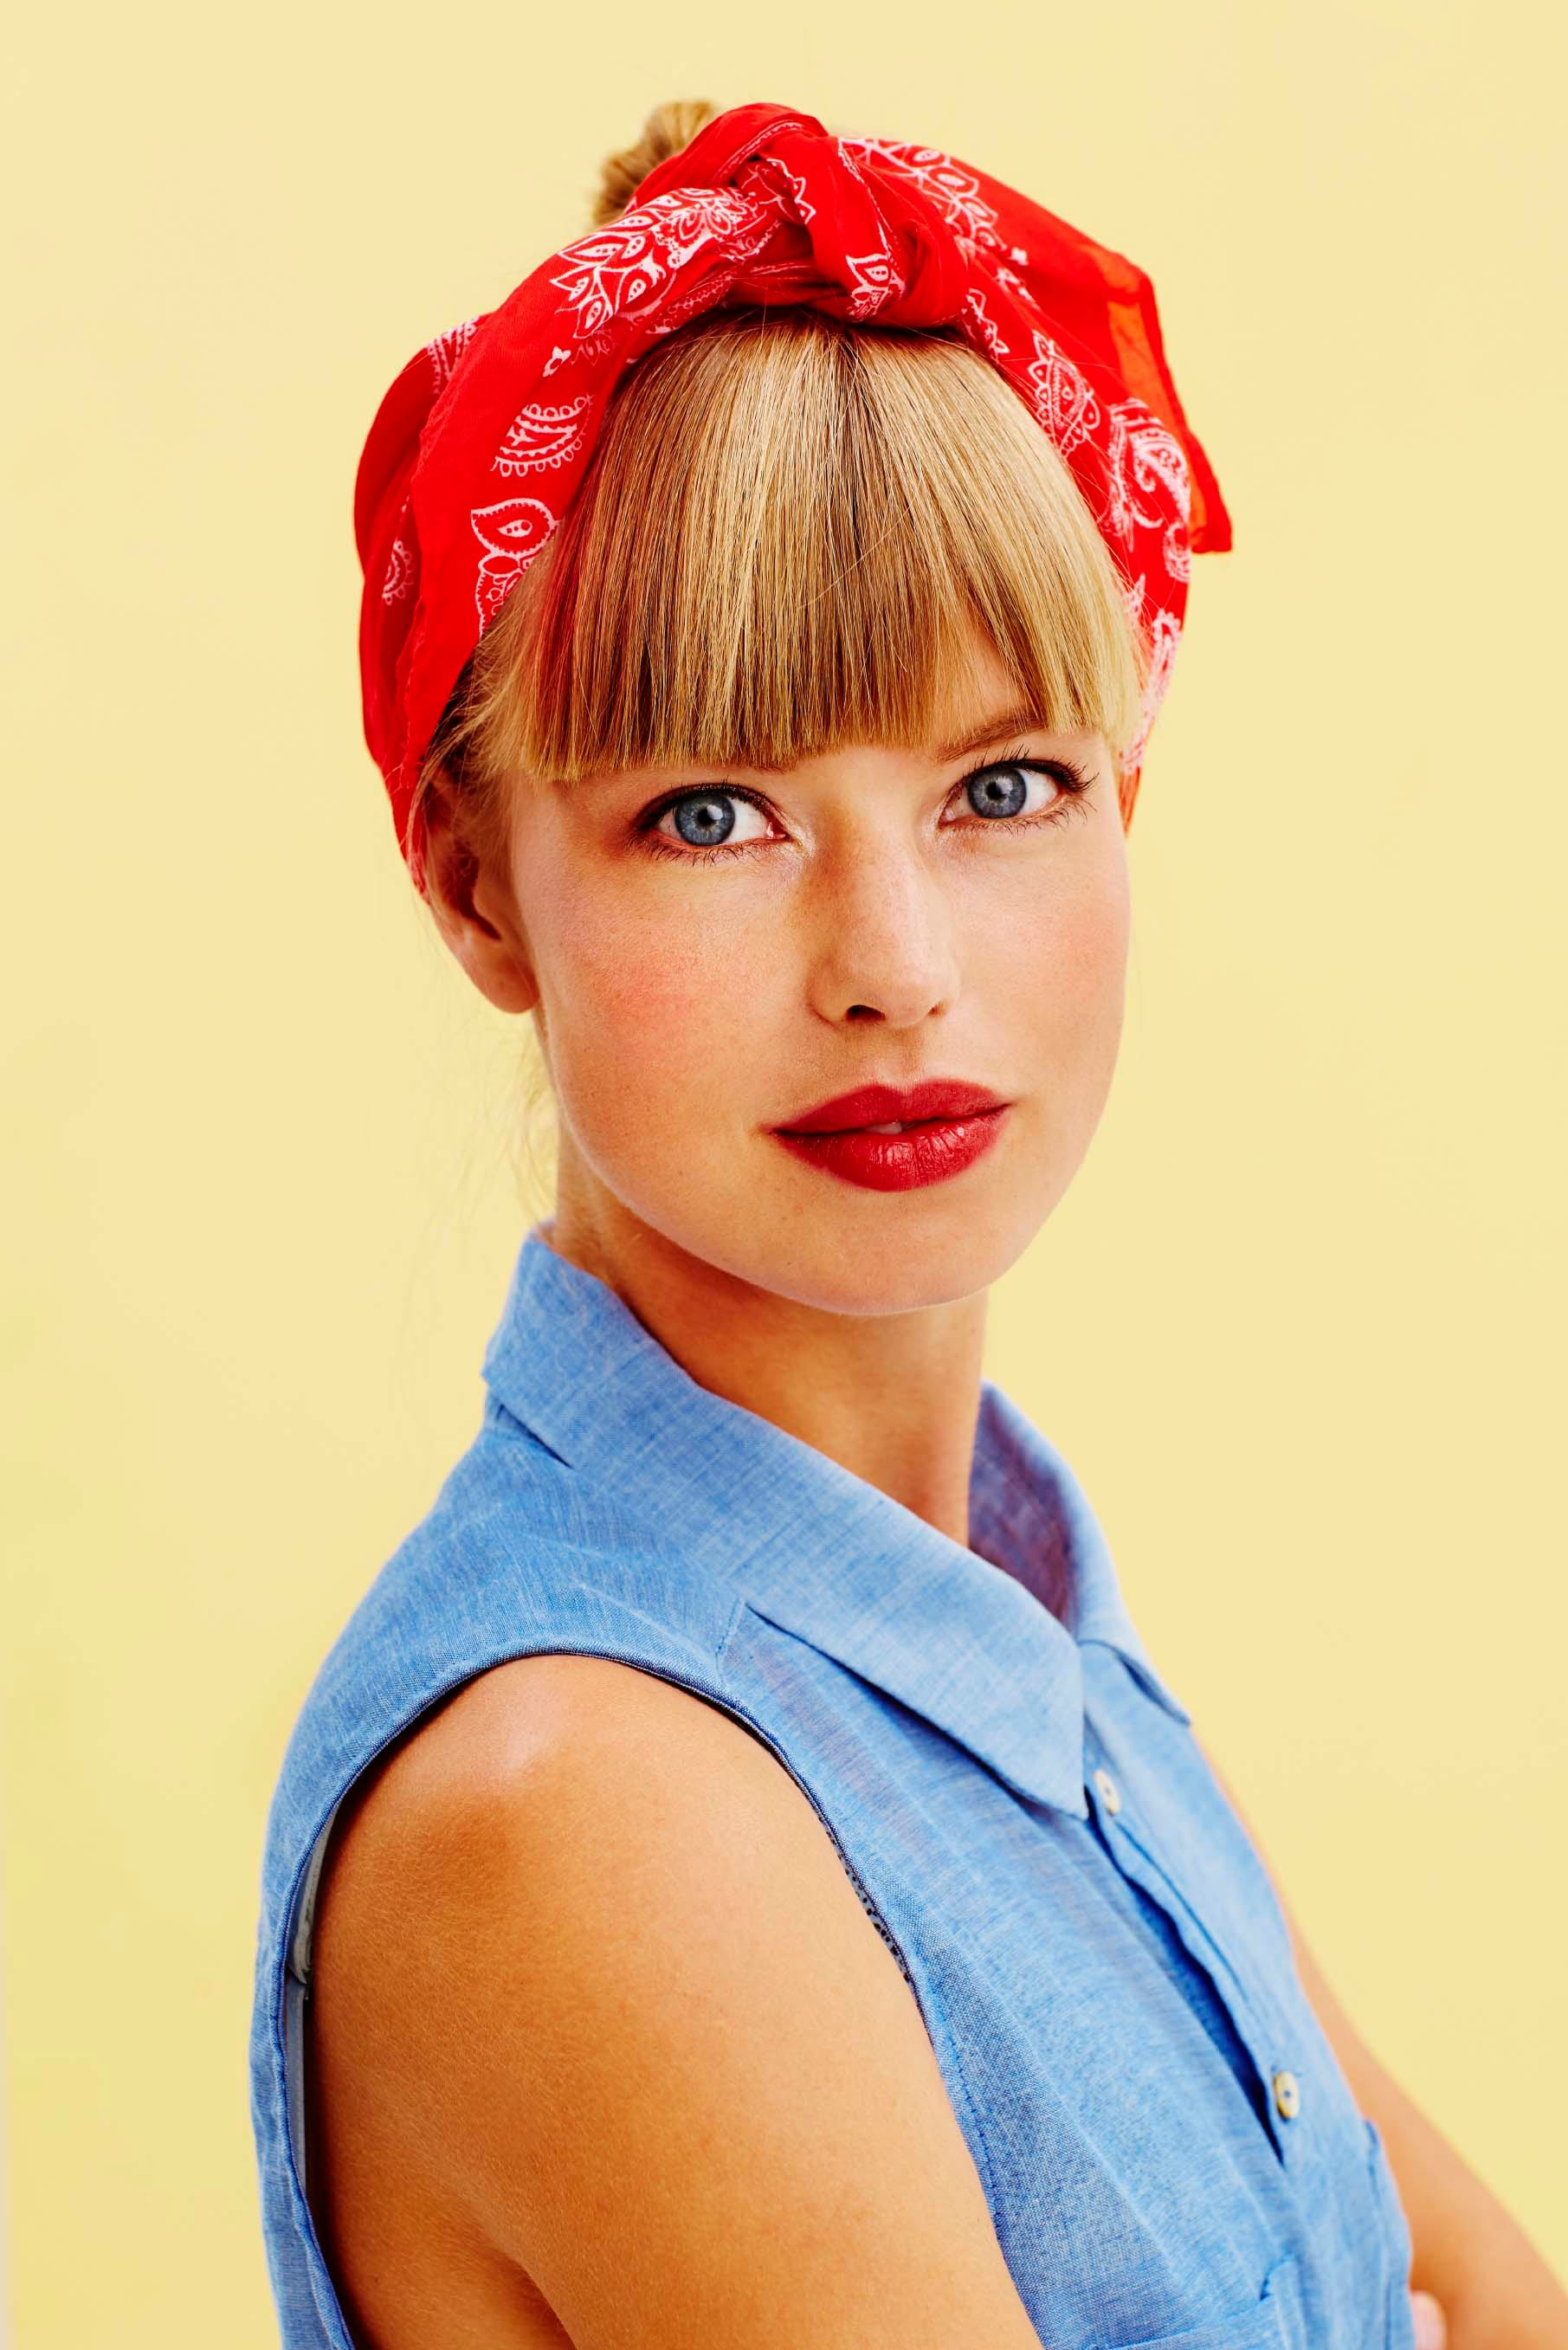 1940s hairstyles red bandana